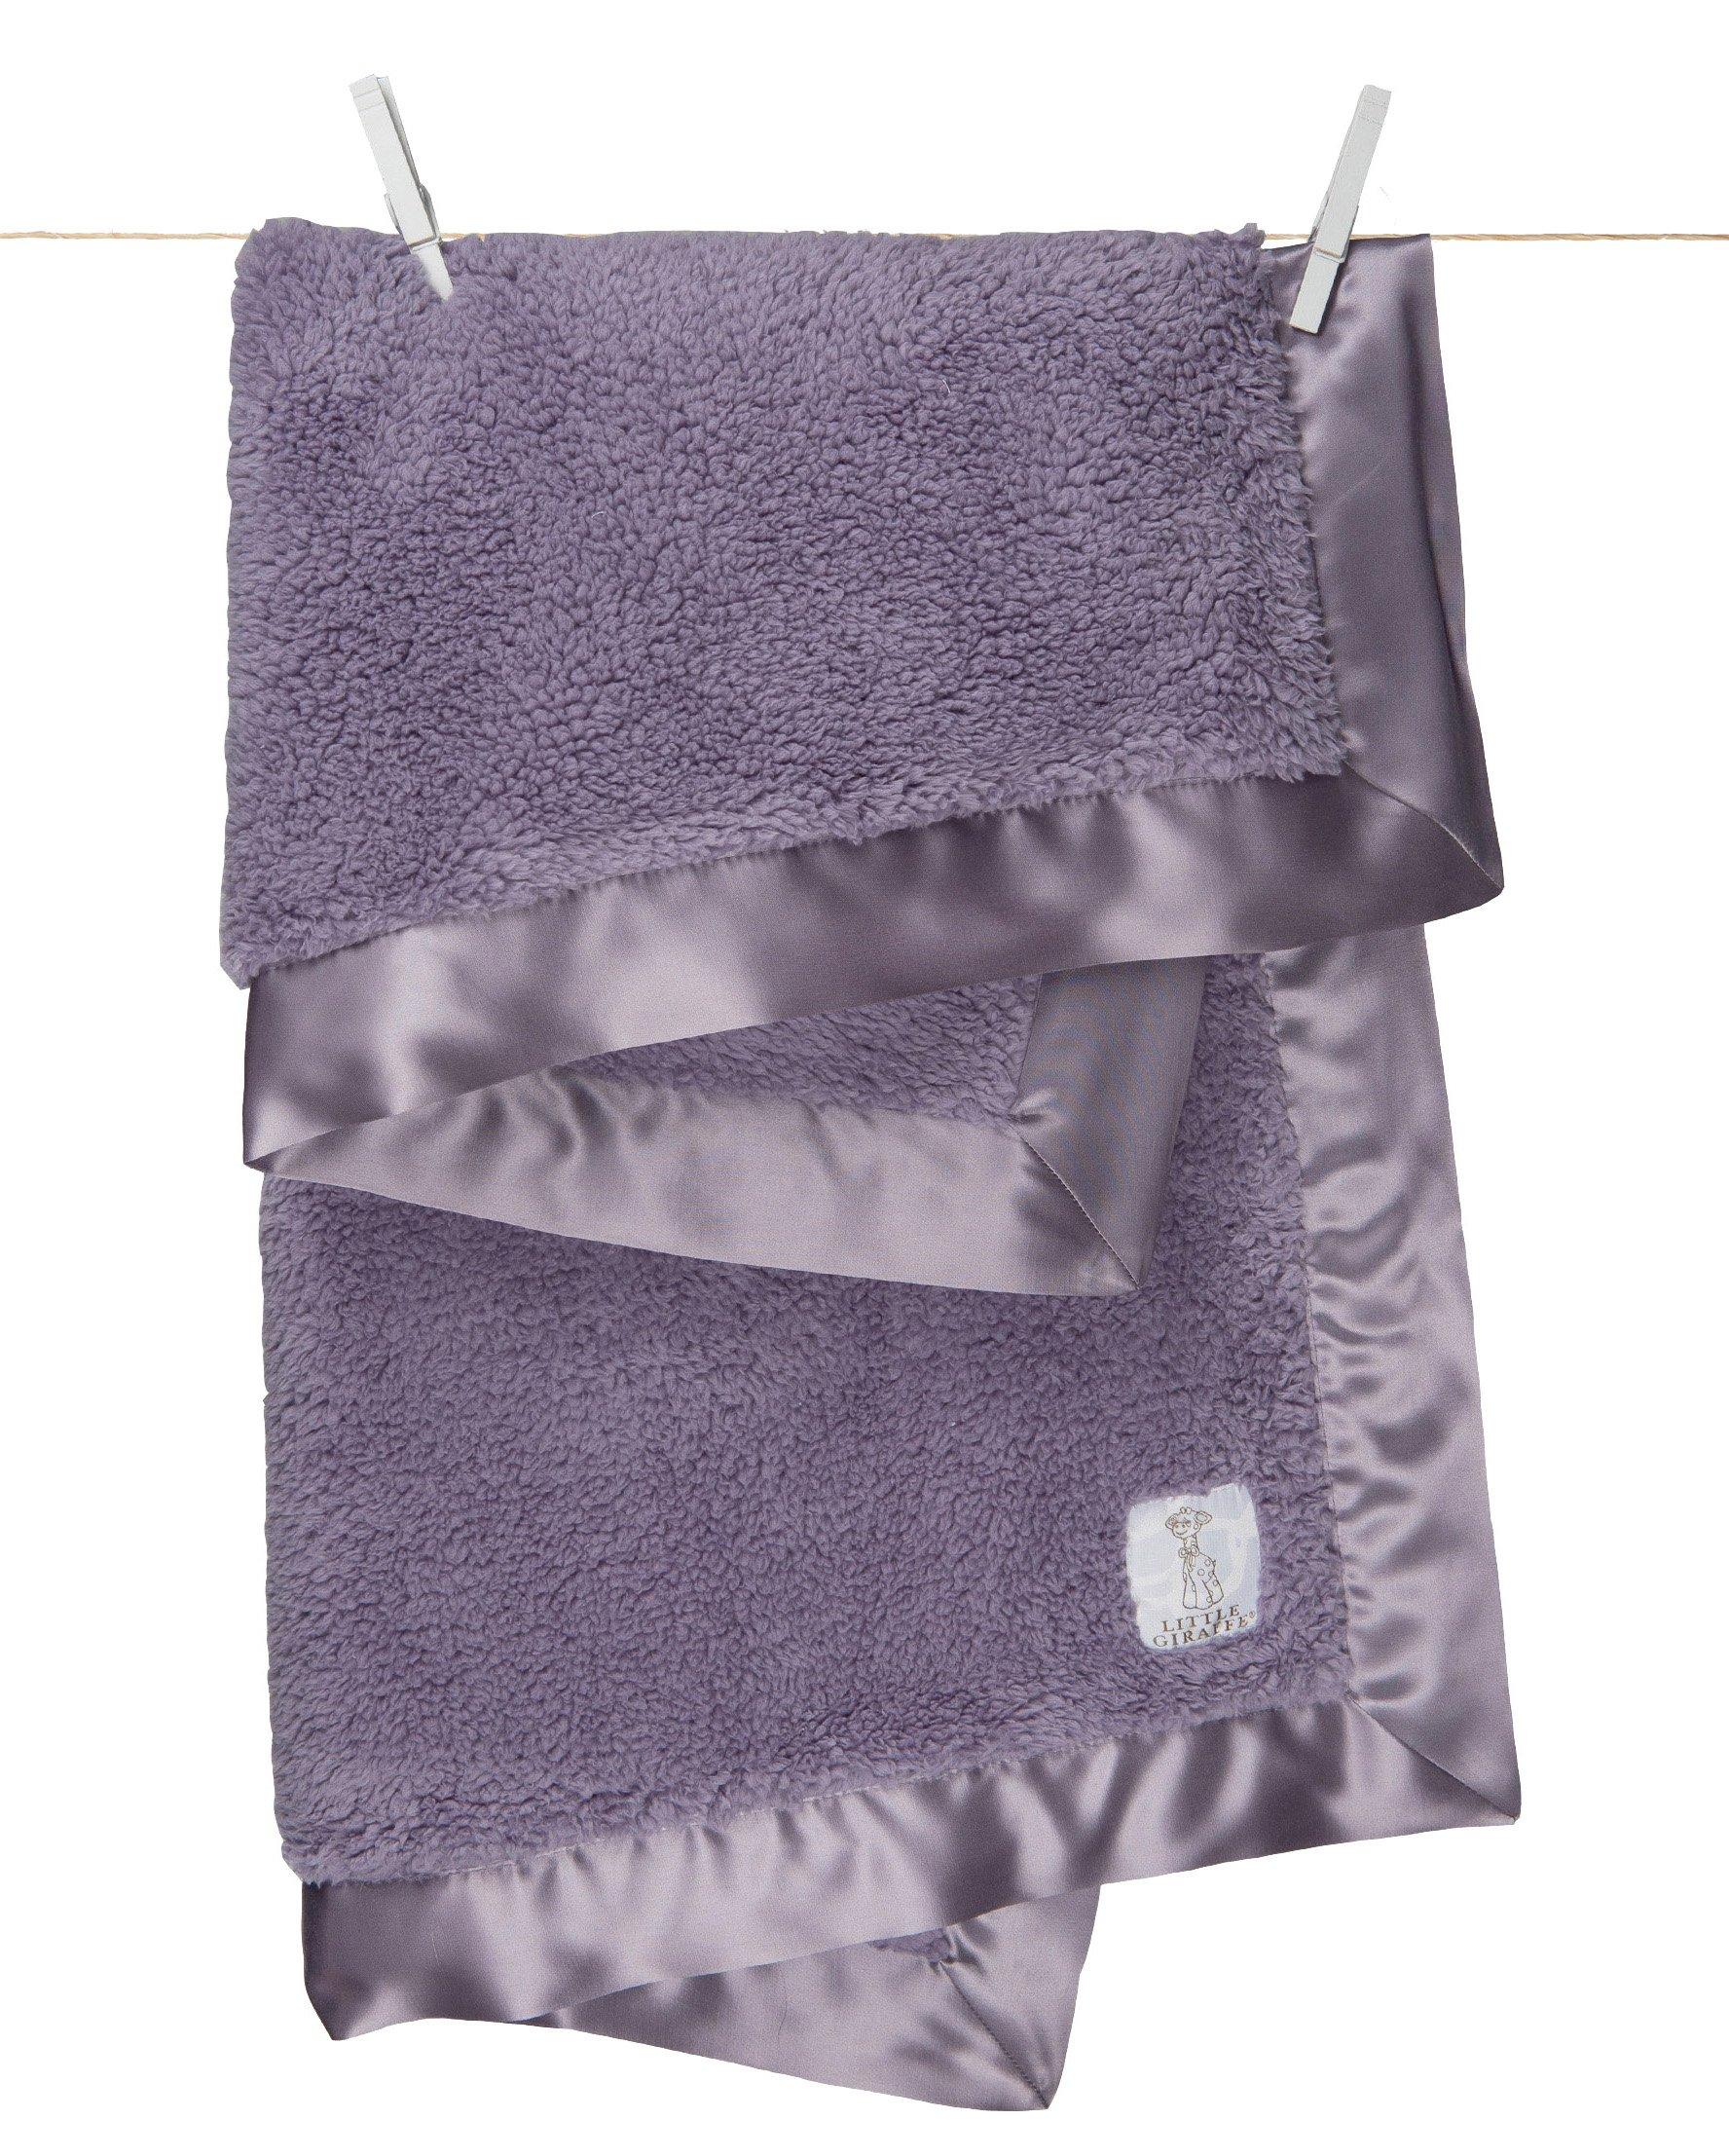 Ritorujirafu Little Giraffe - Dealer imports] BELLA blanket (lavender) / BOX containing lg0057-05B